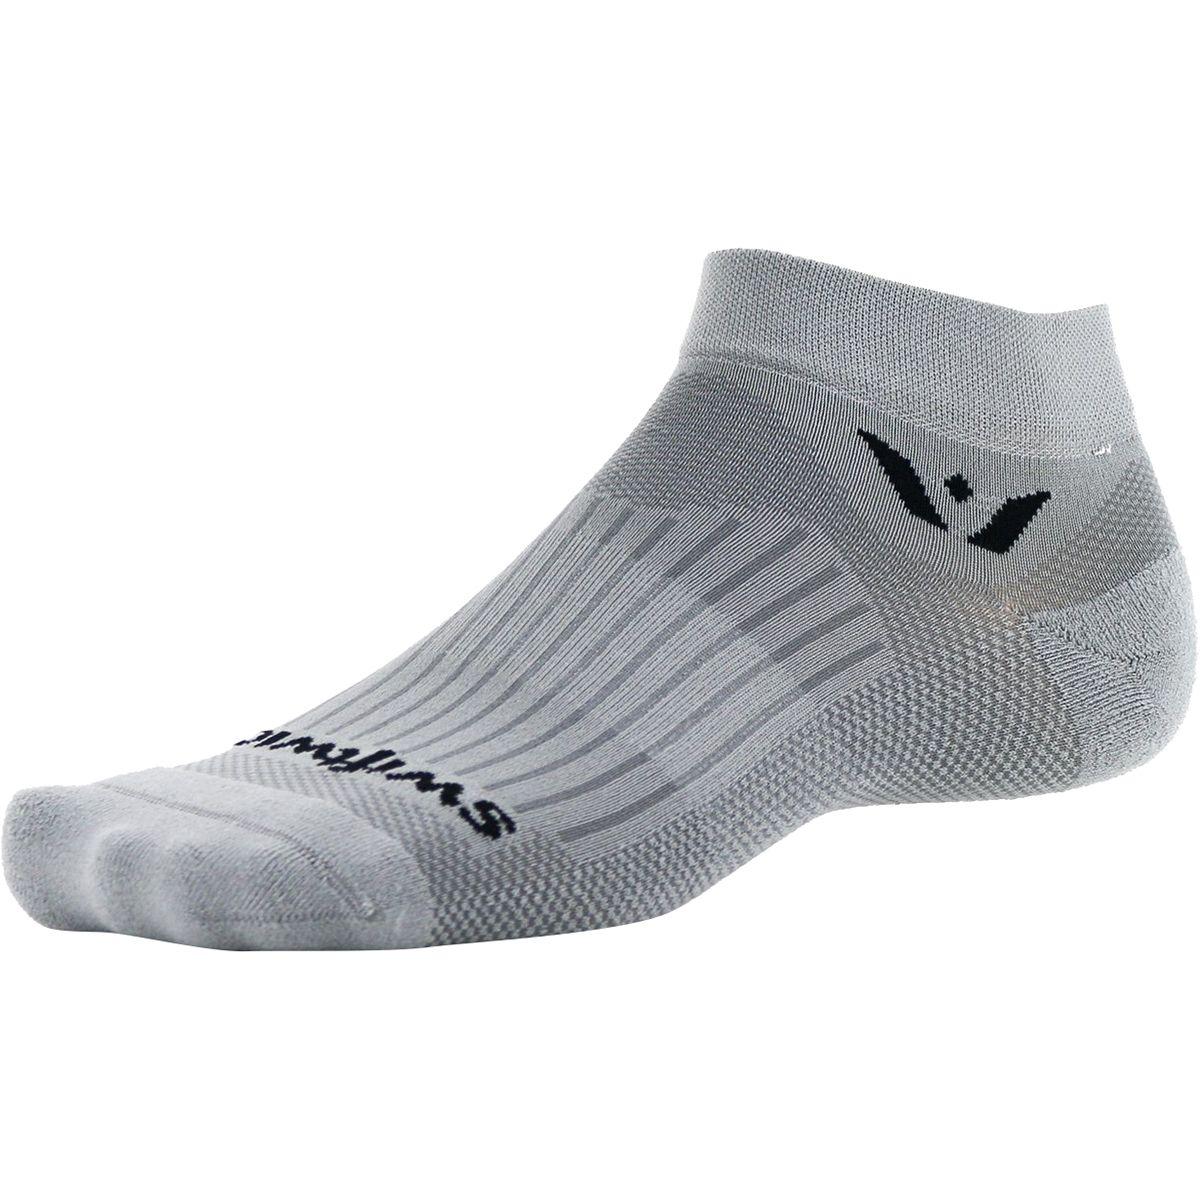 Swiftwick Aspire One Sock